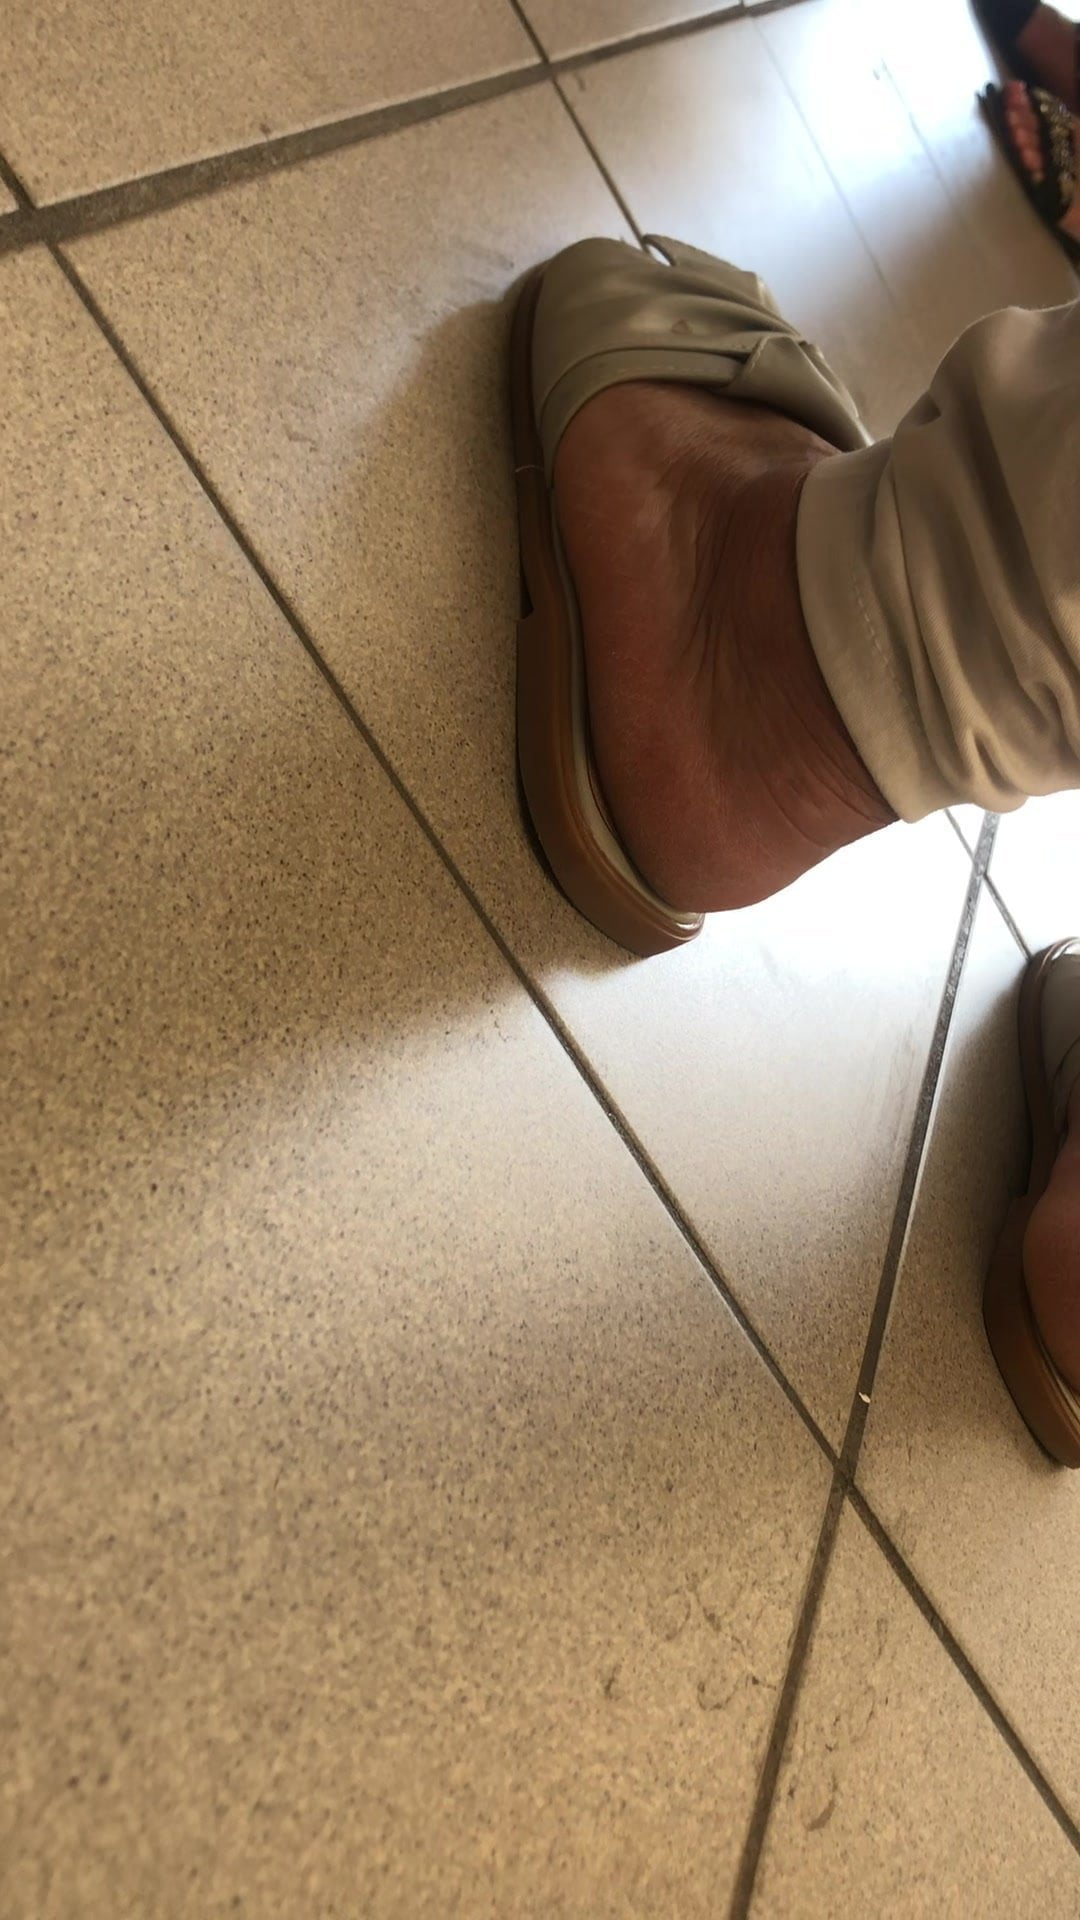 Candid arab mature feet heel